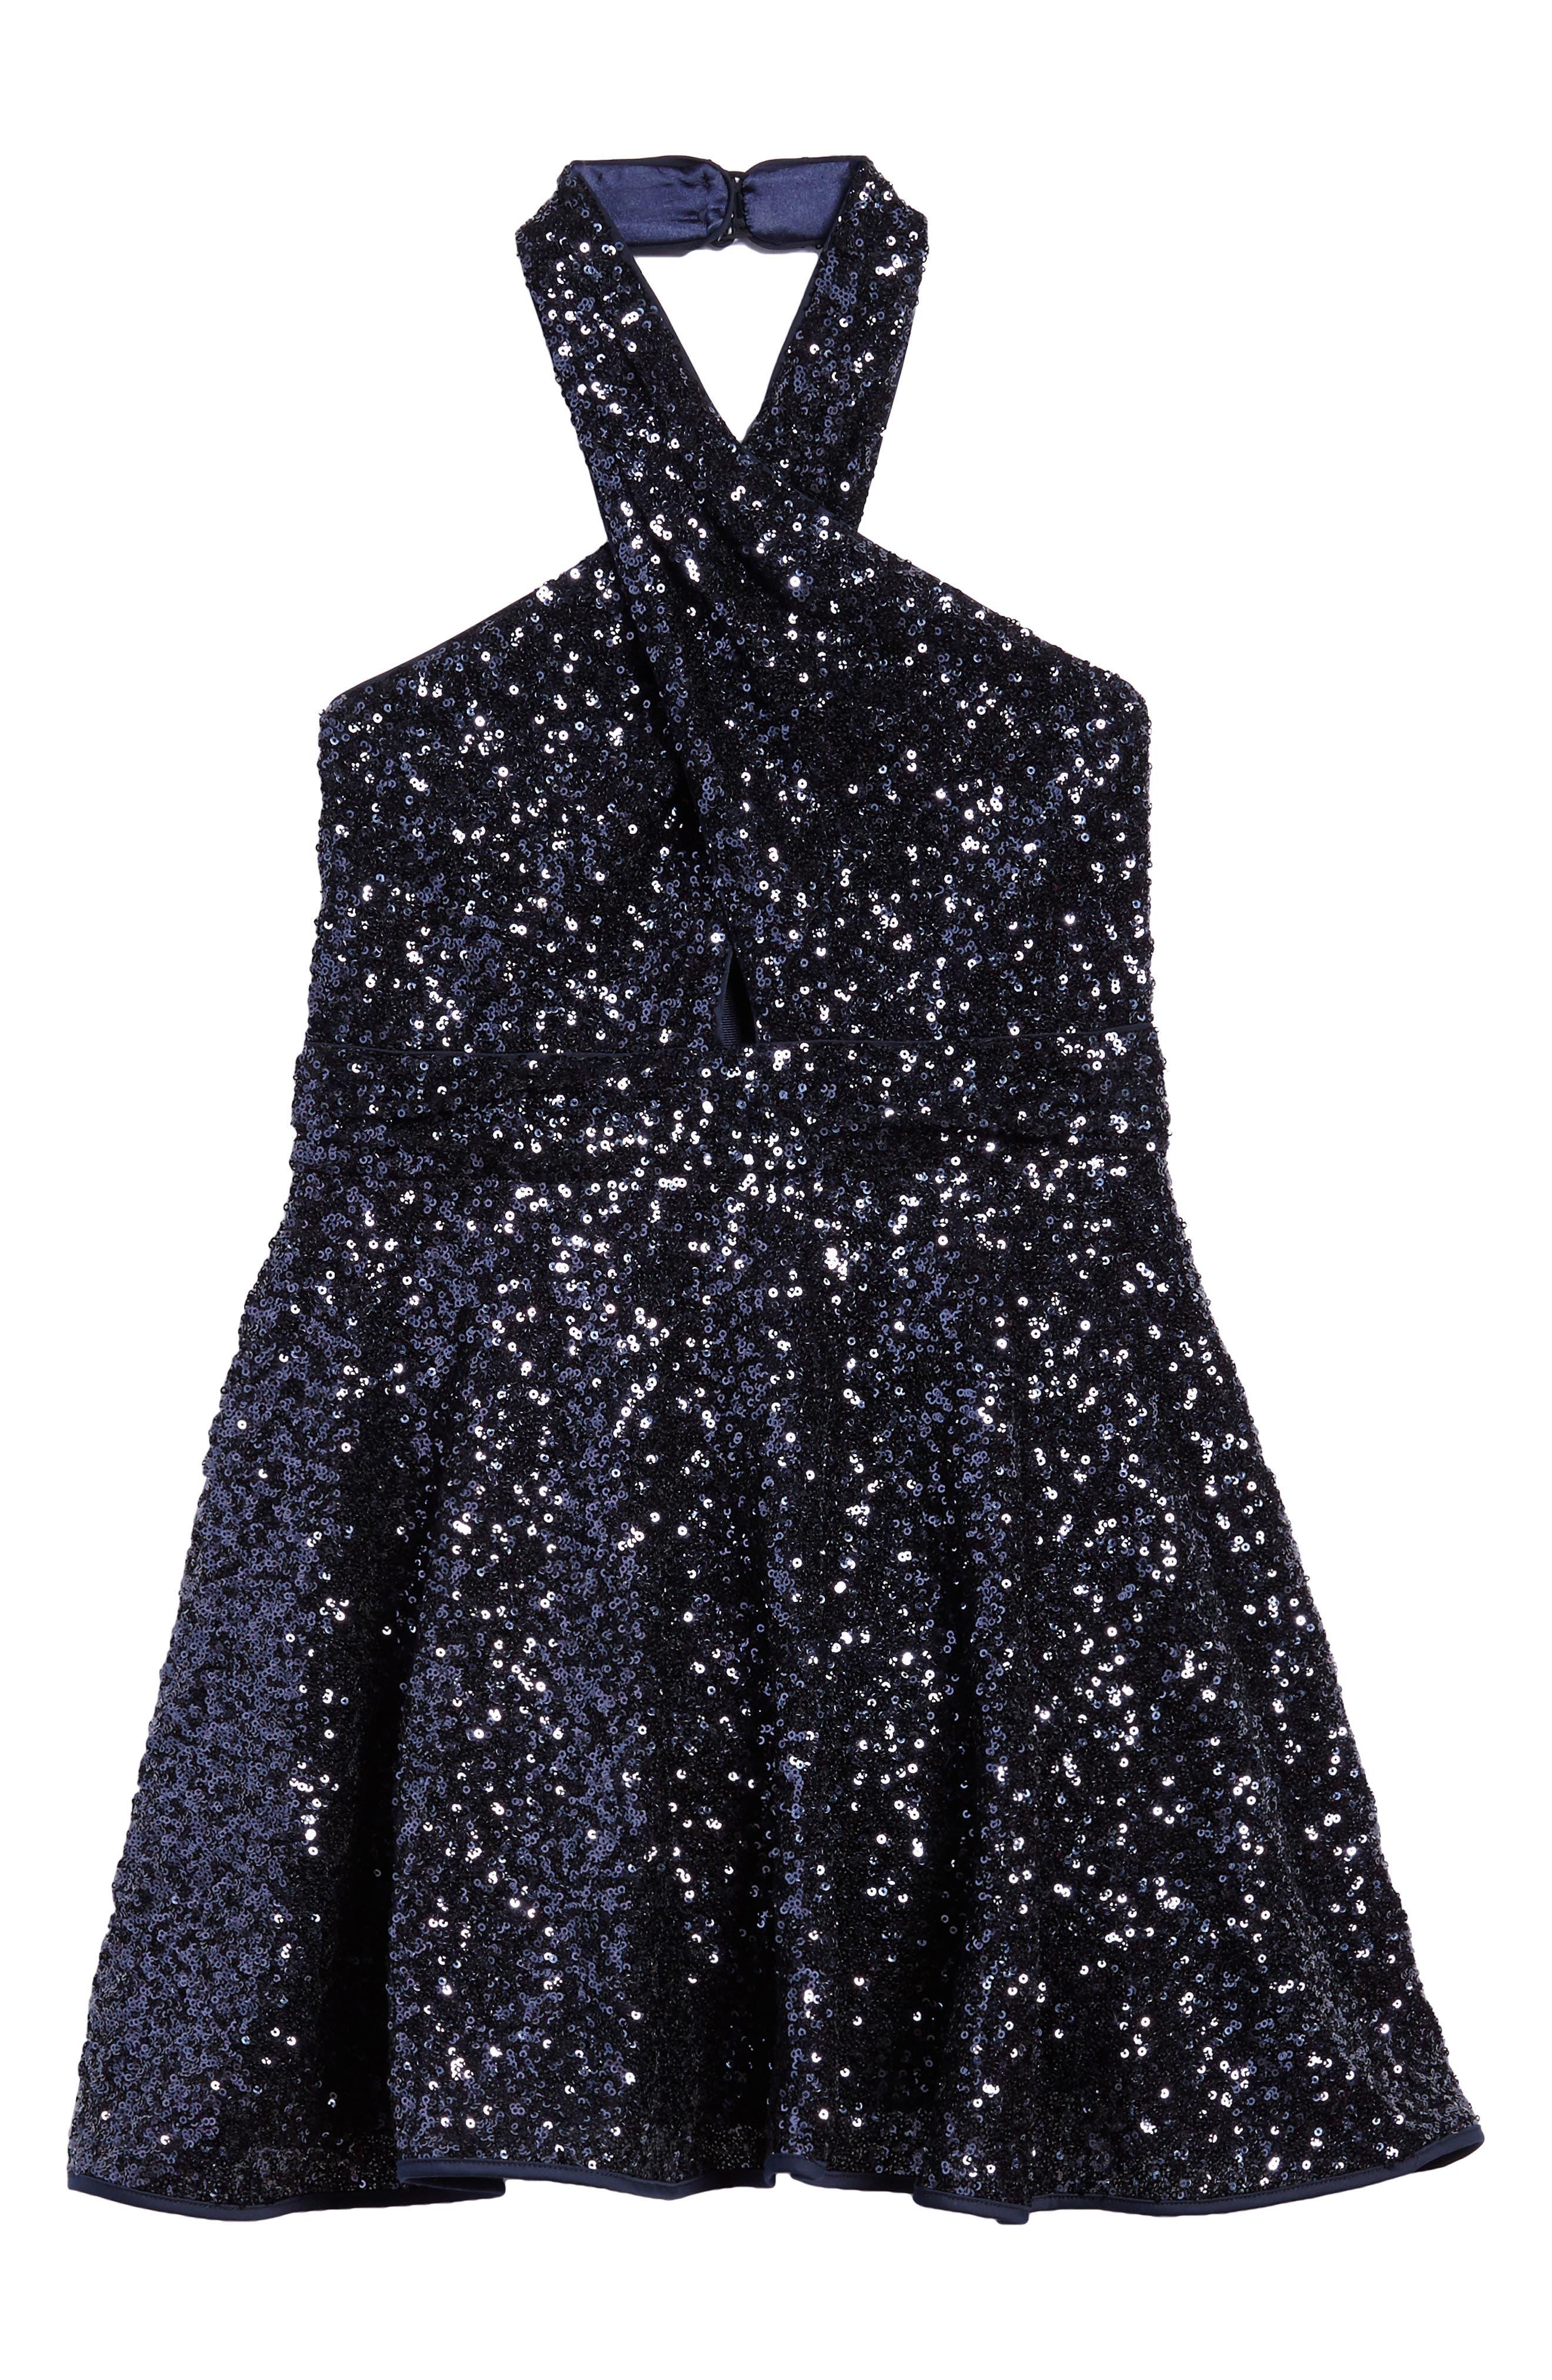 Sydney Sequin Halter Dress,                         Main,                         color, 410